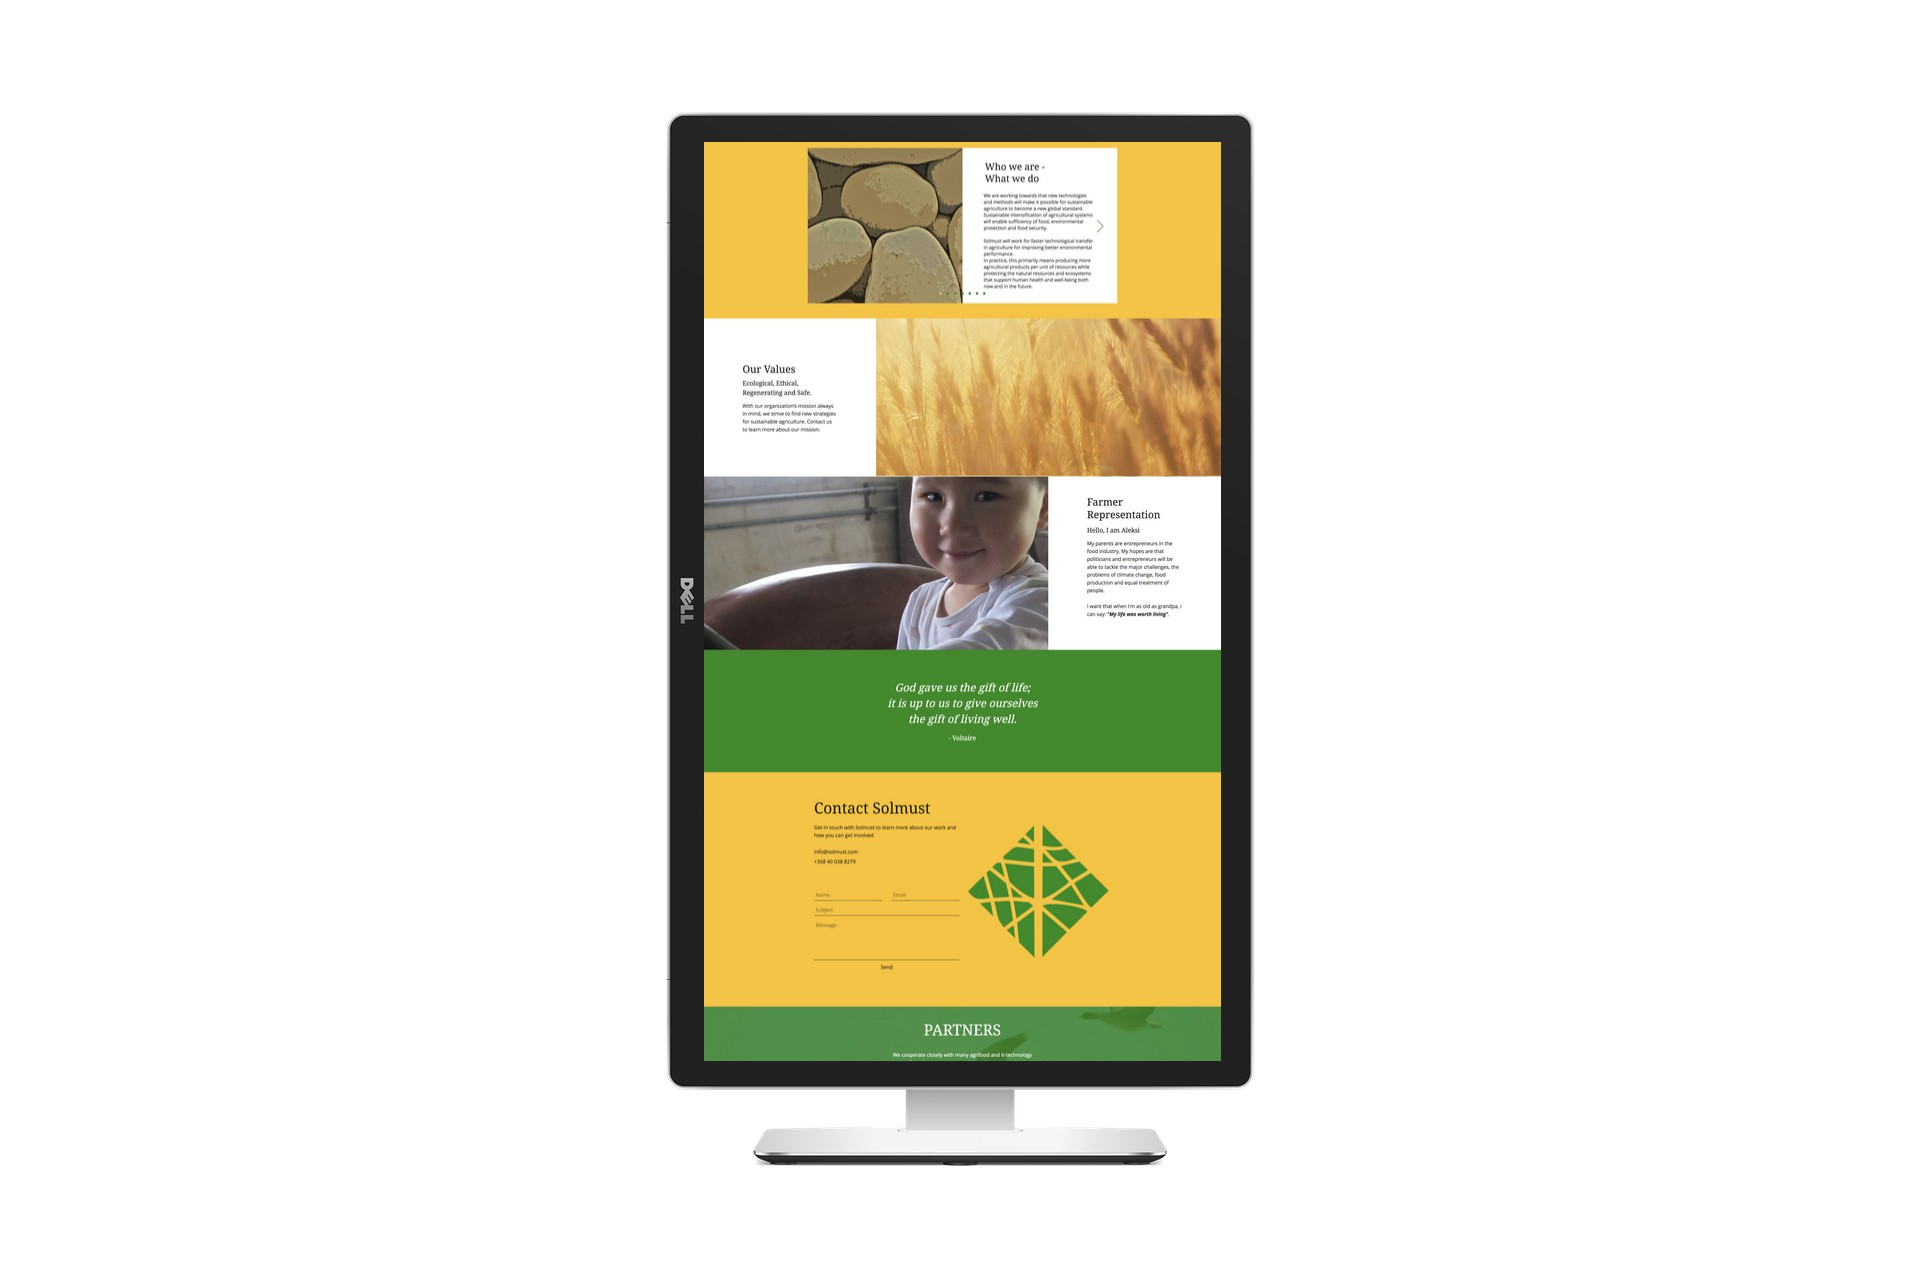 Solmust vertical website view